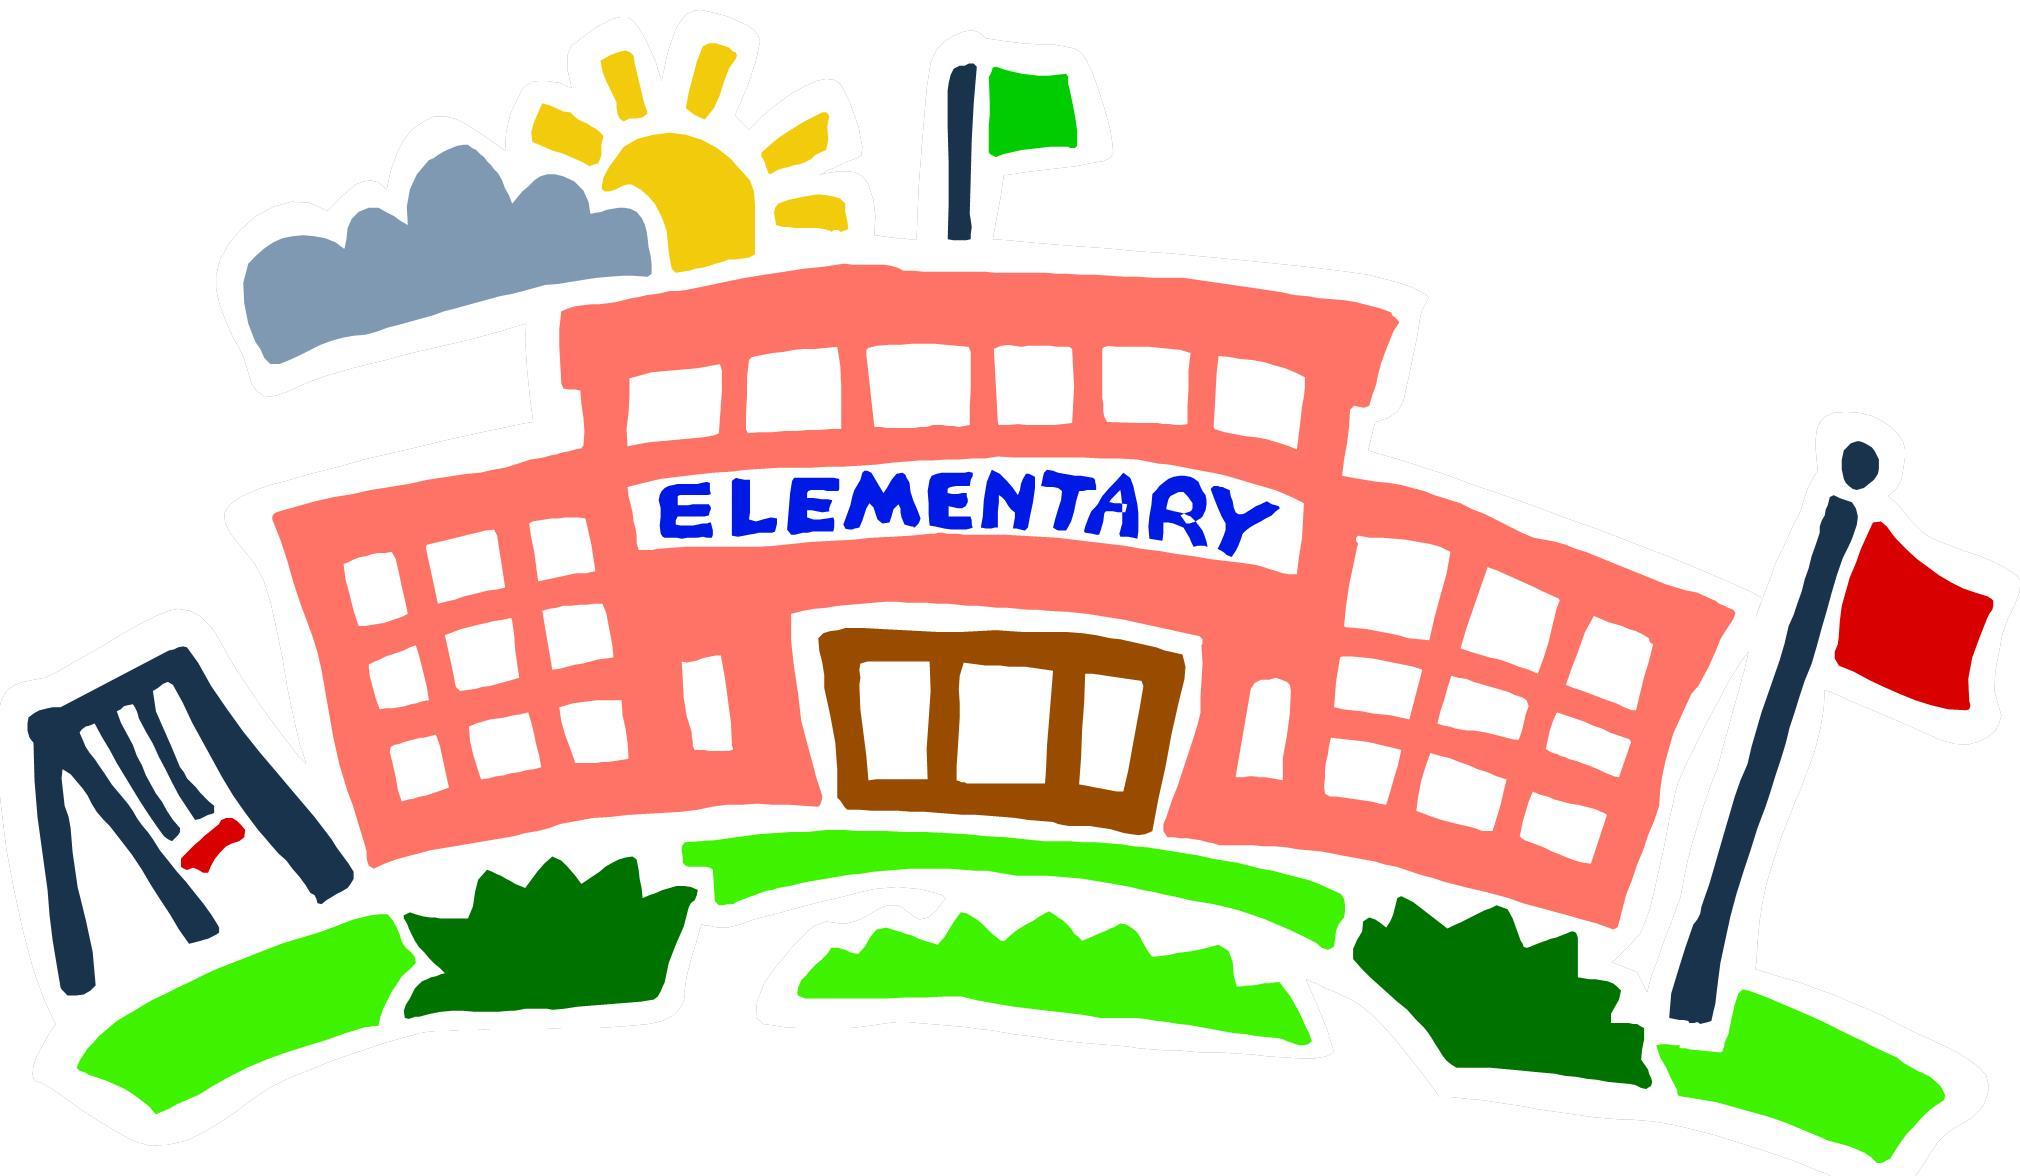 2020x1176 Elementary School Clipart